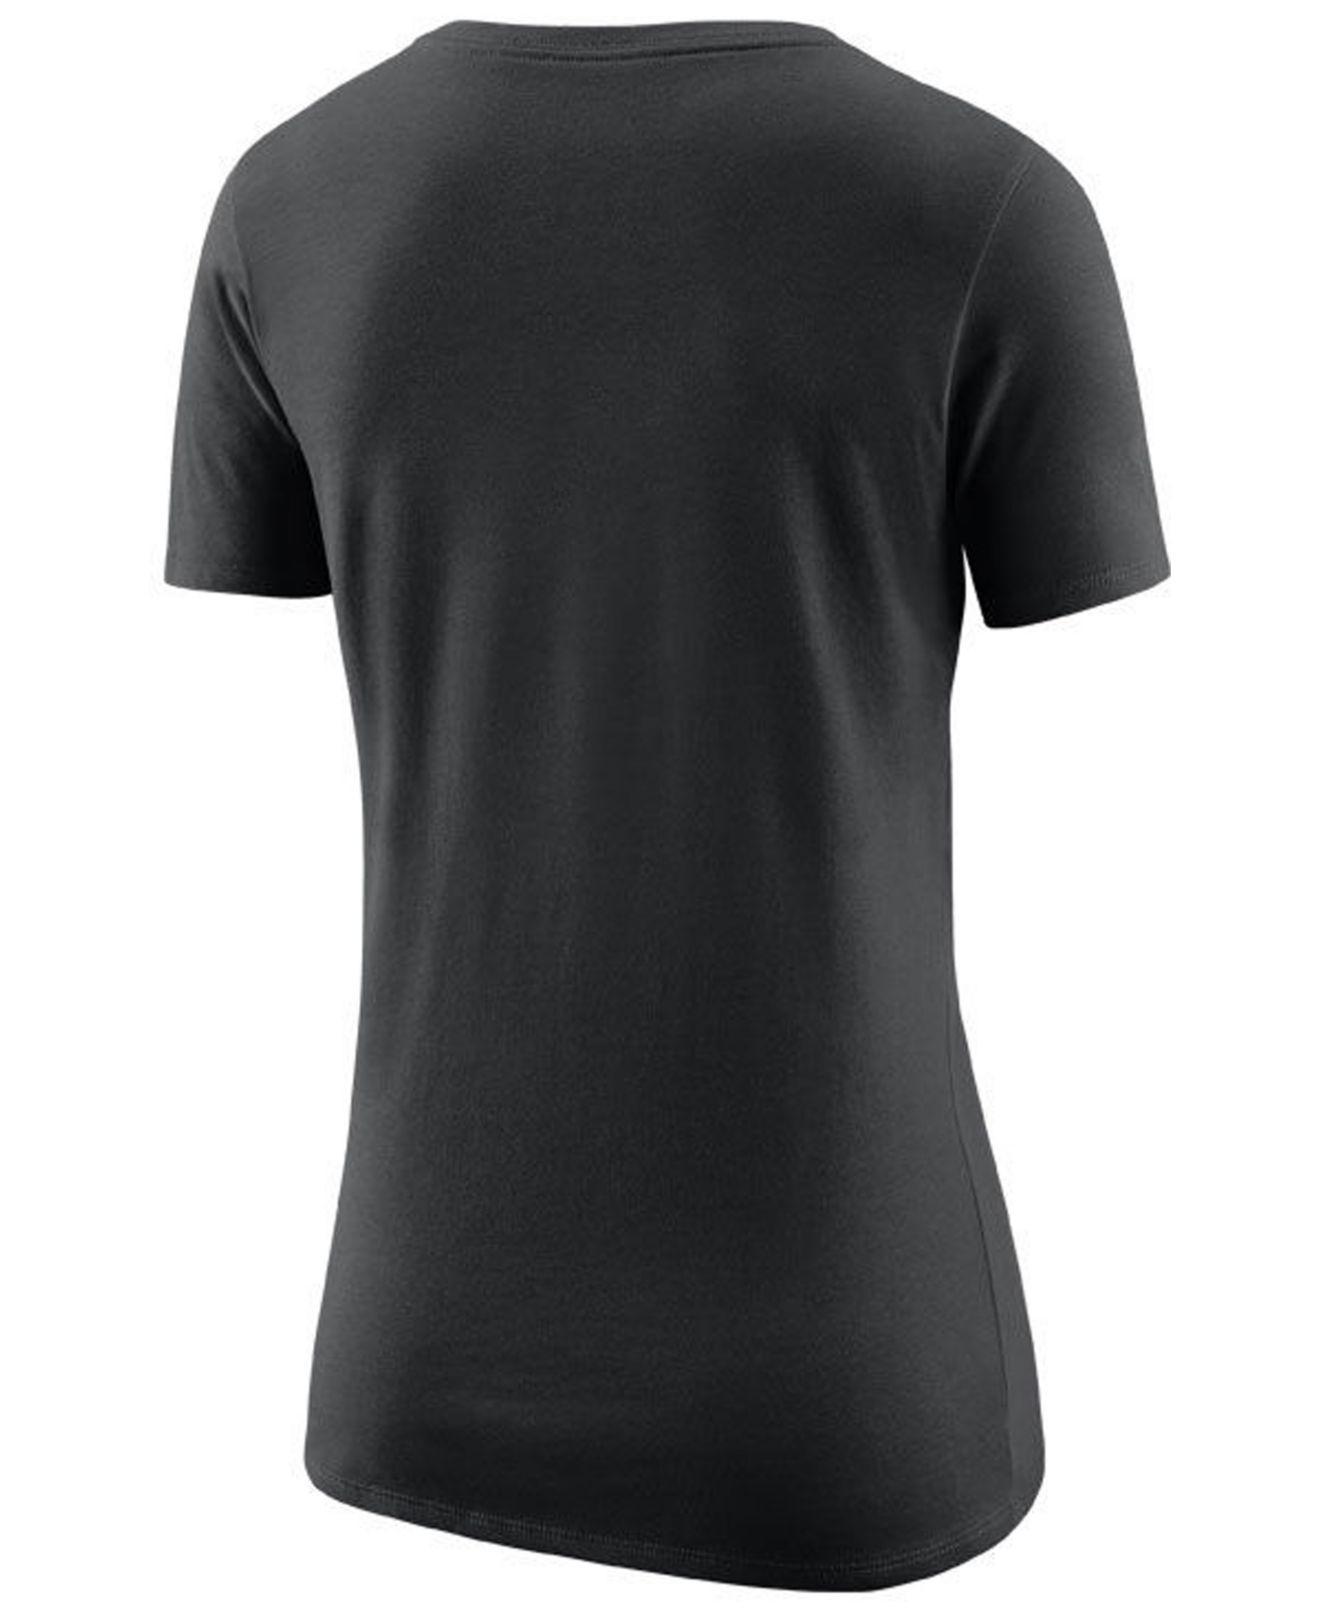 Lyst - Nike San Antonio Spurs Logo T-shirt in Black 155173e6d